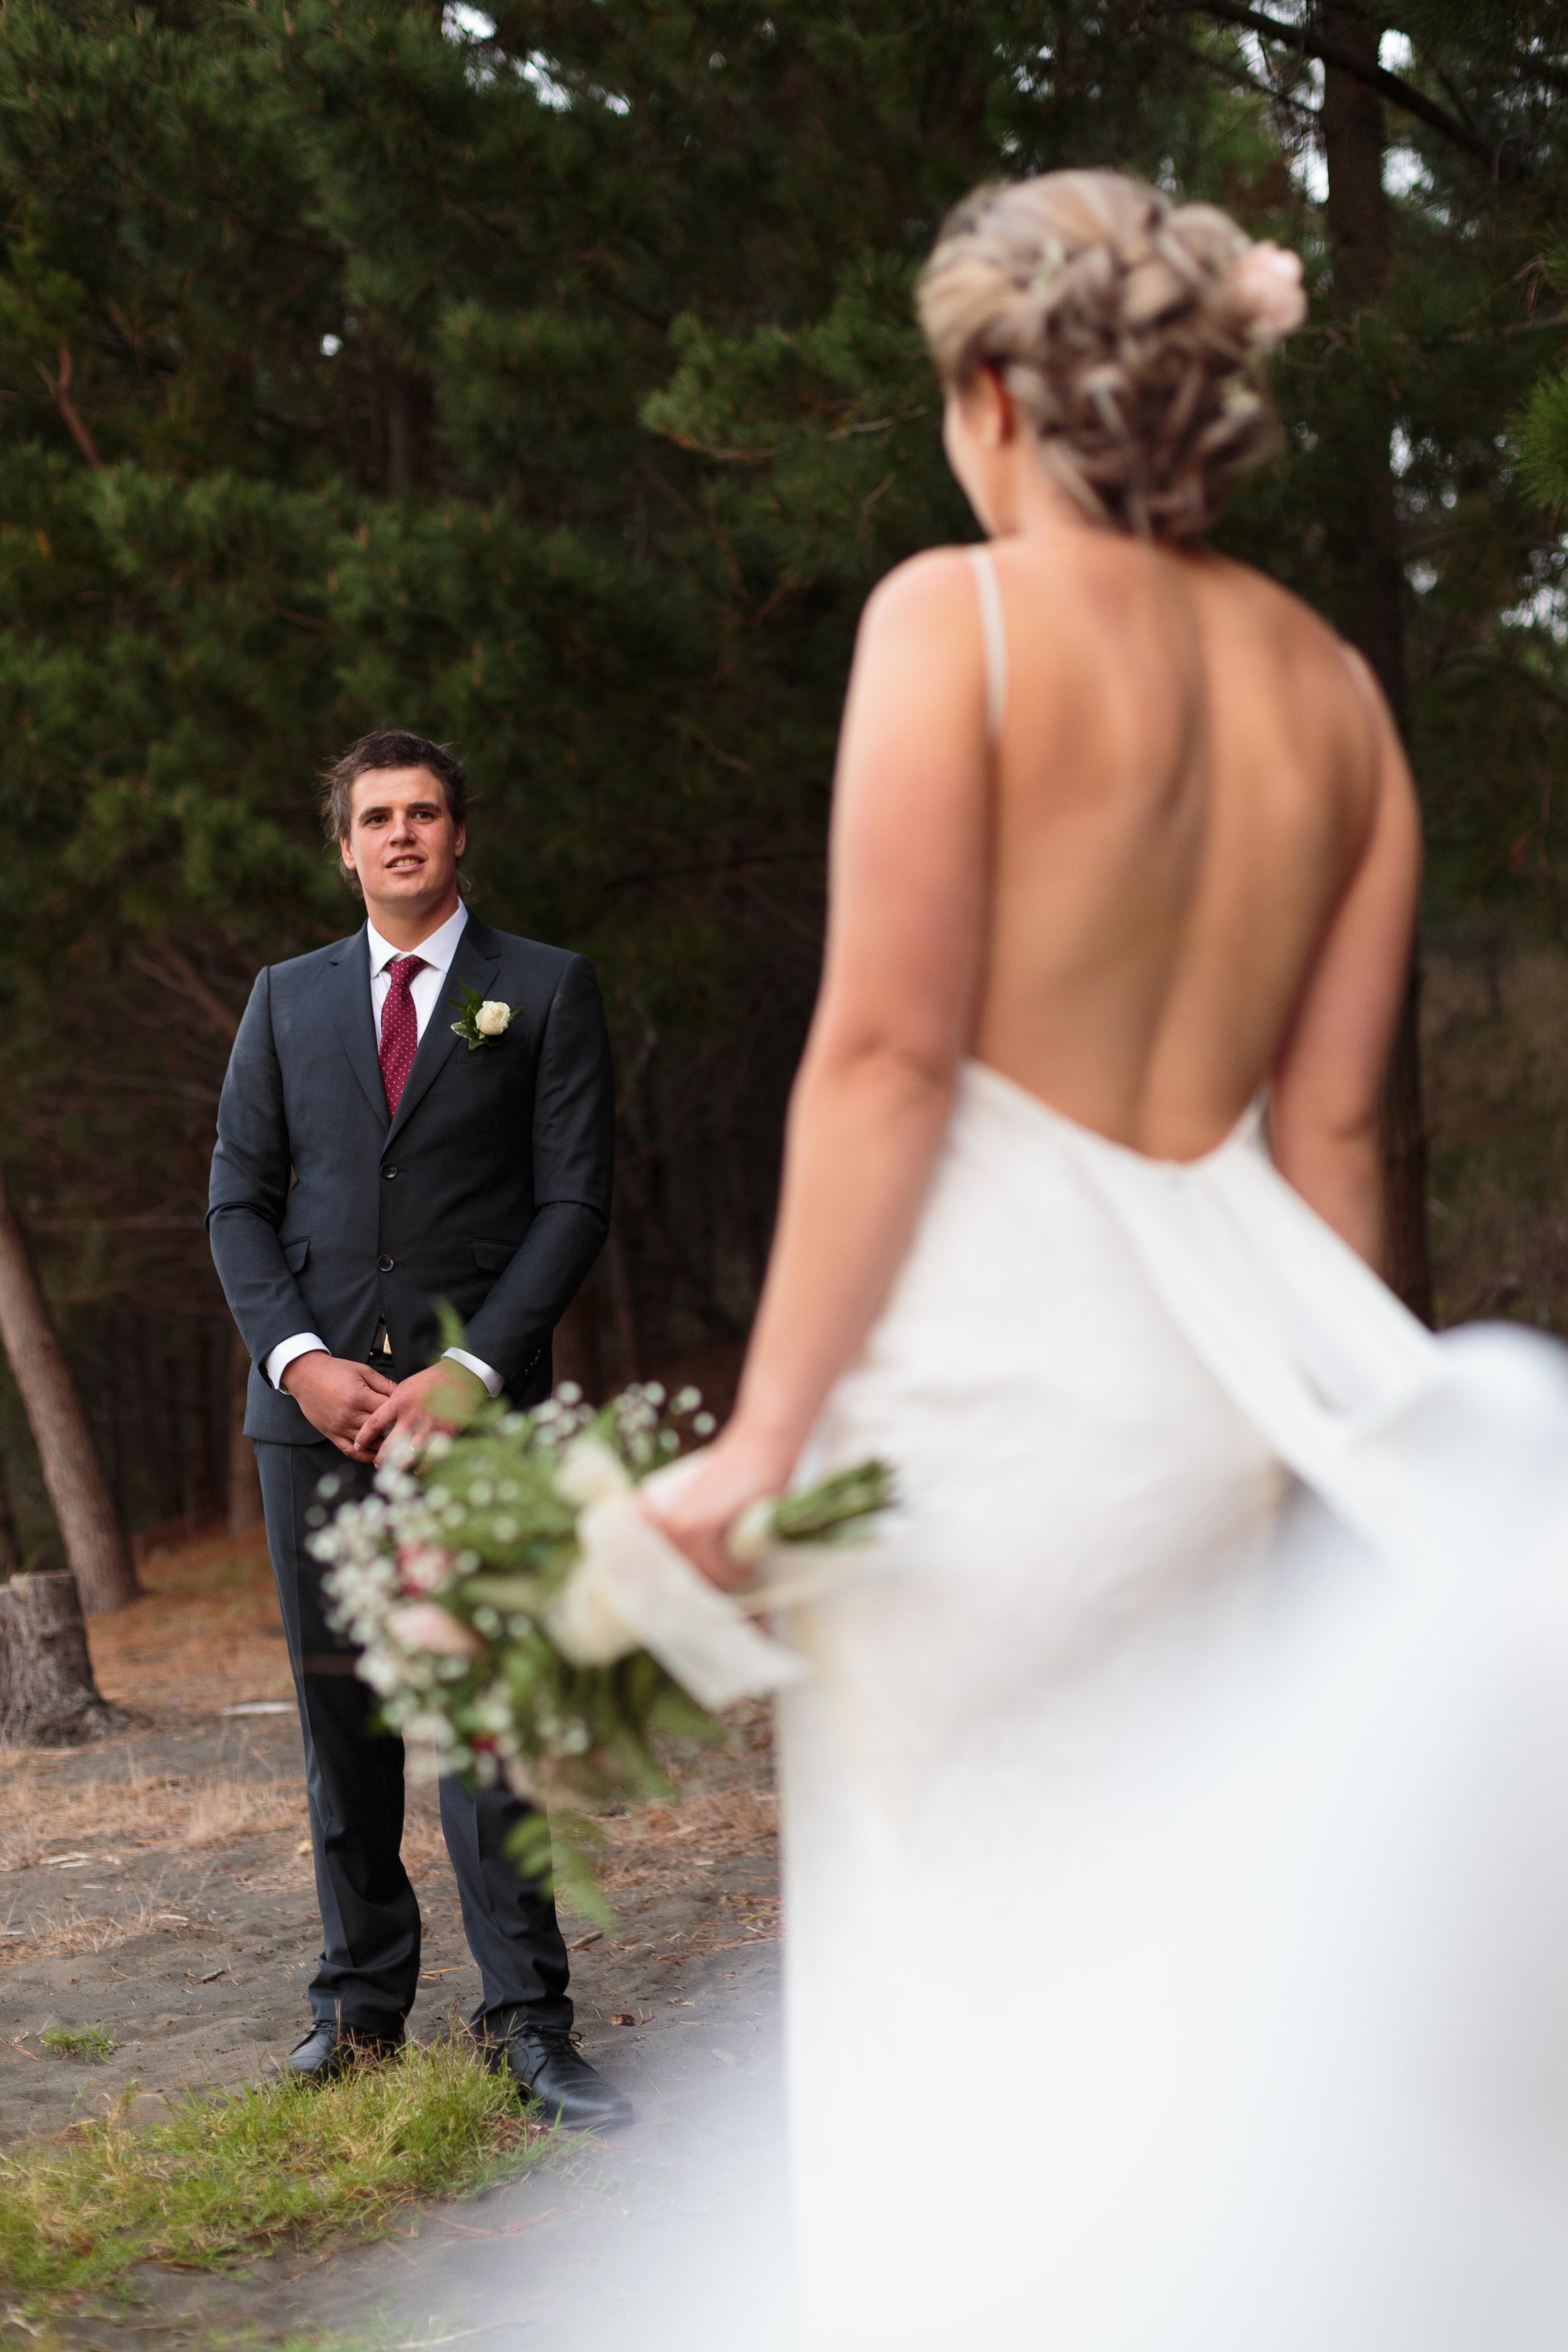 Highight-wedding-photography-dudding-lake-palmerston-north-new-zealand-92.jpg